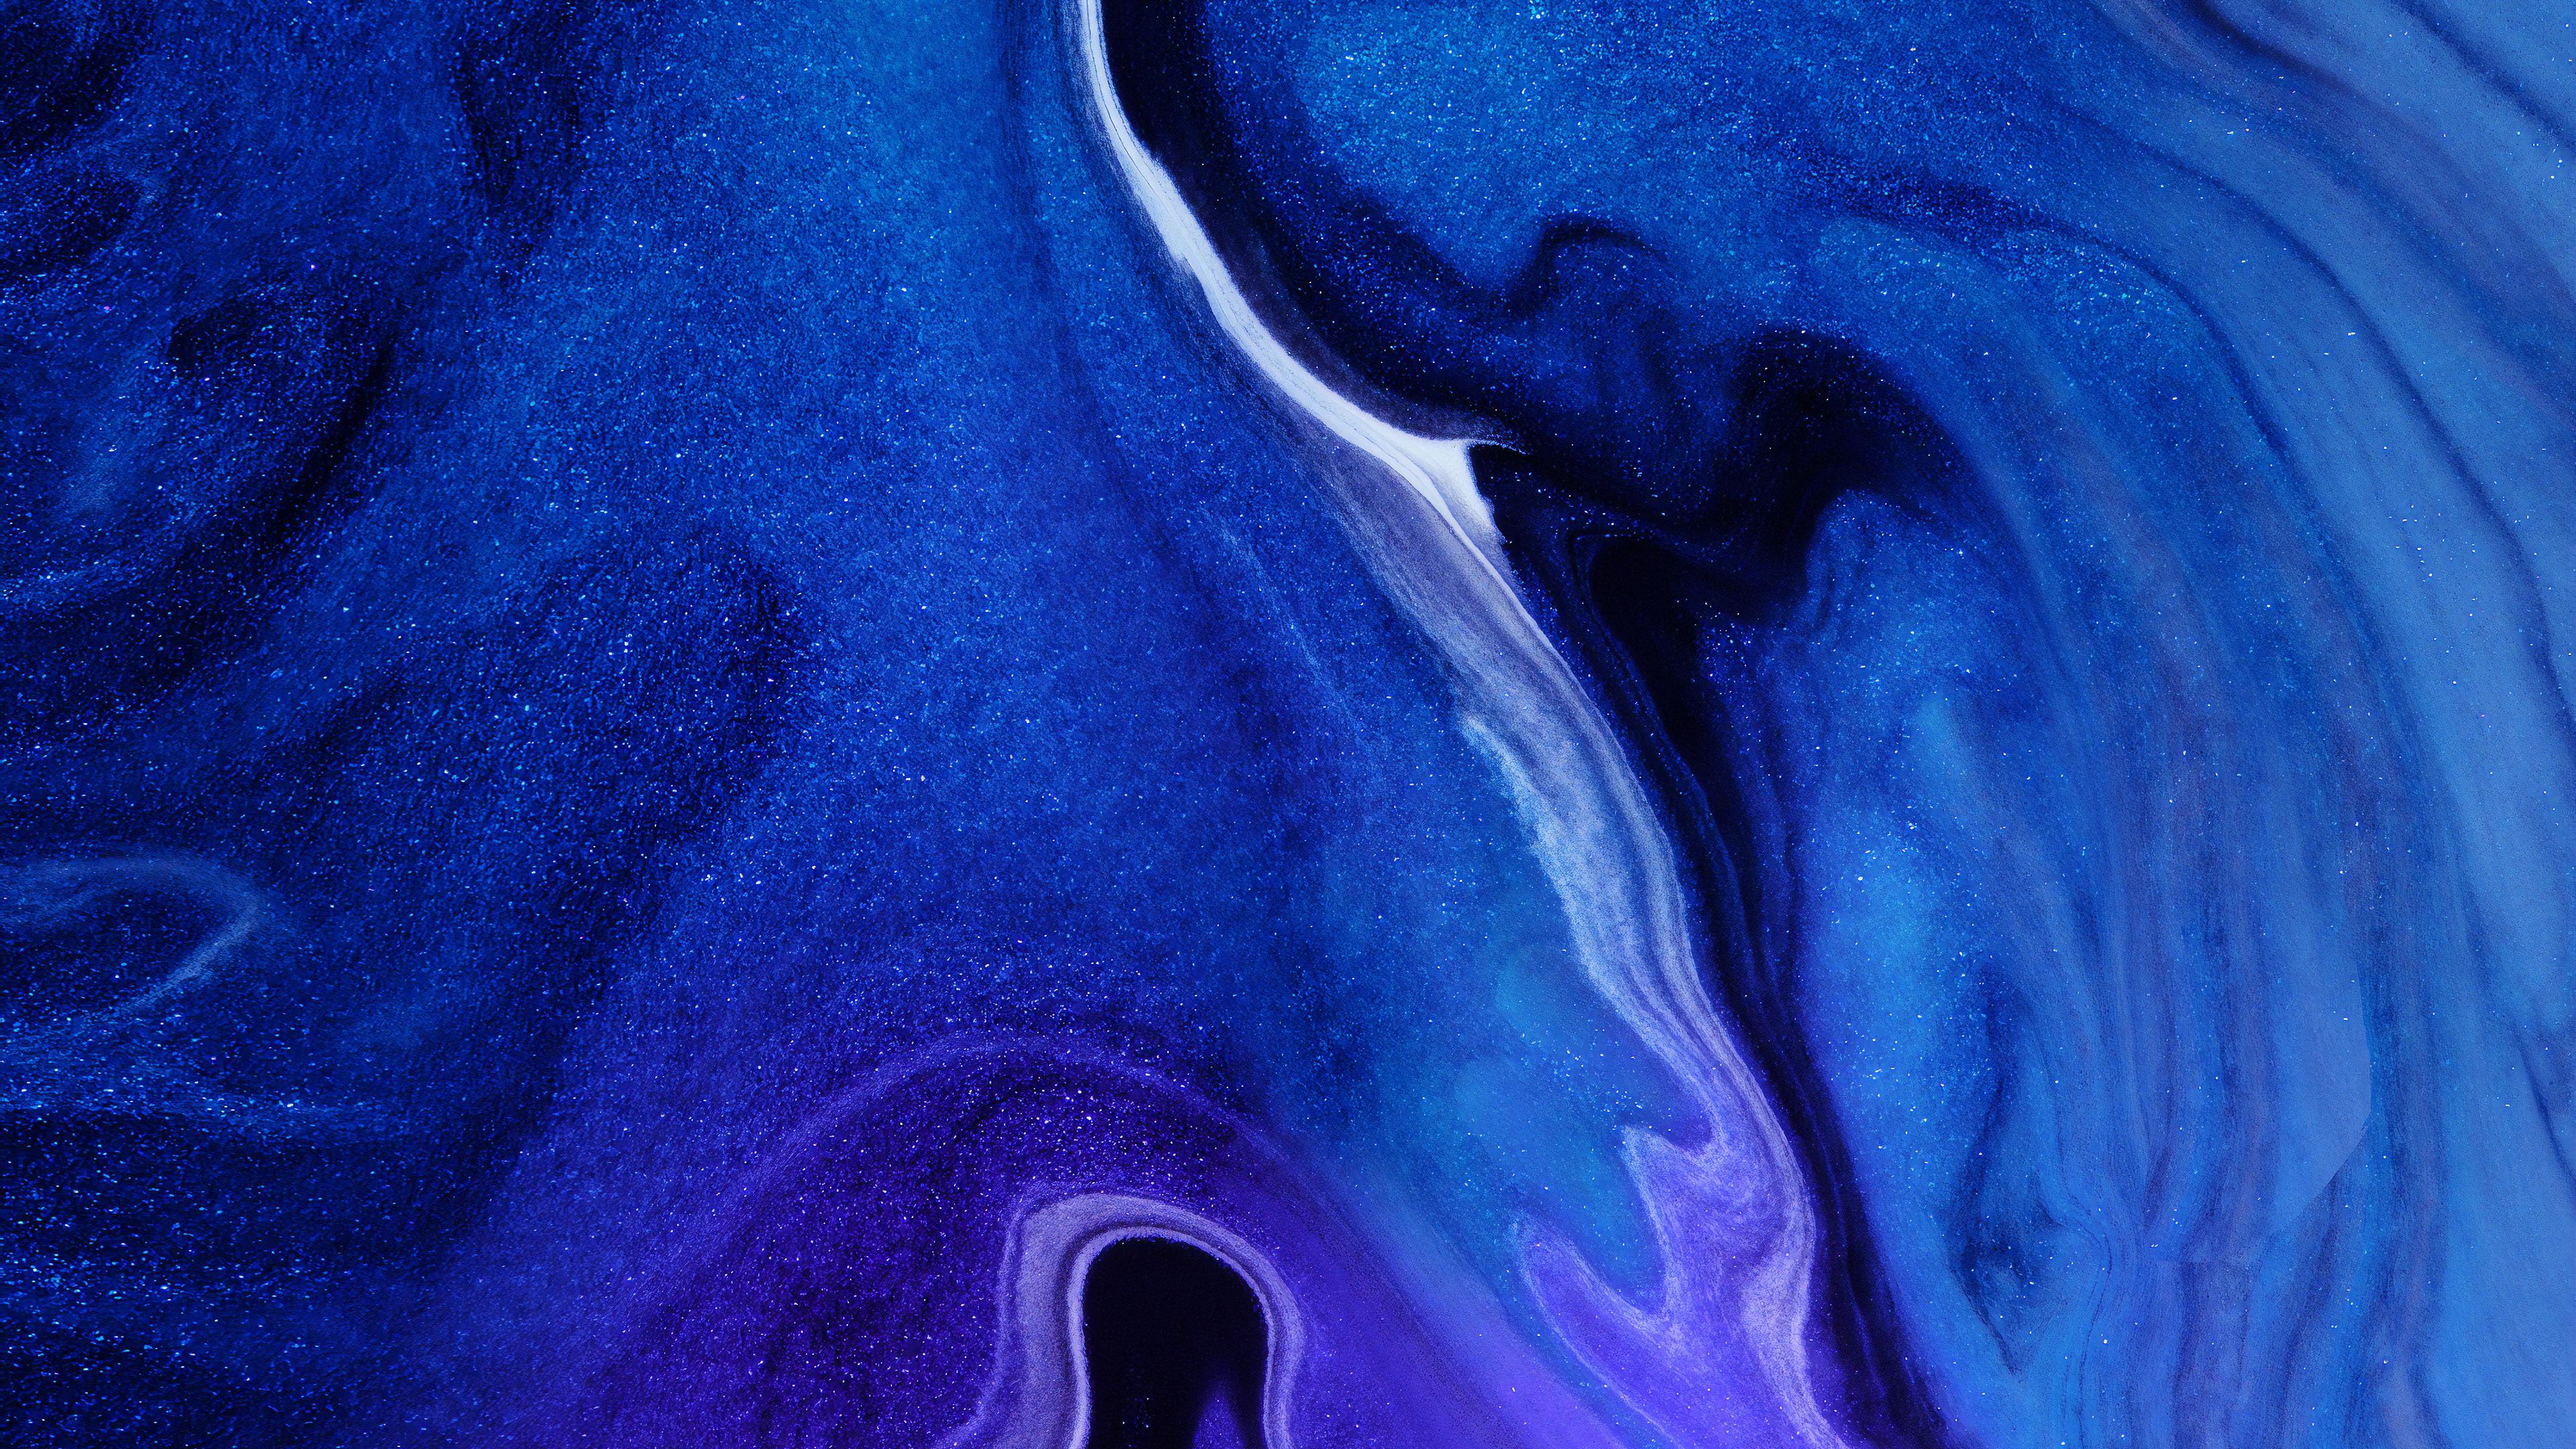 750x1334 Dark Blue Color Burst 4k Iphone 6 Iphone 6s